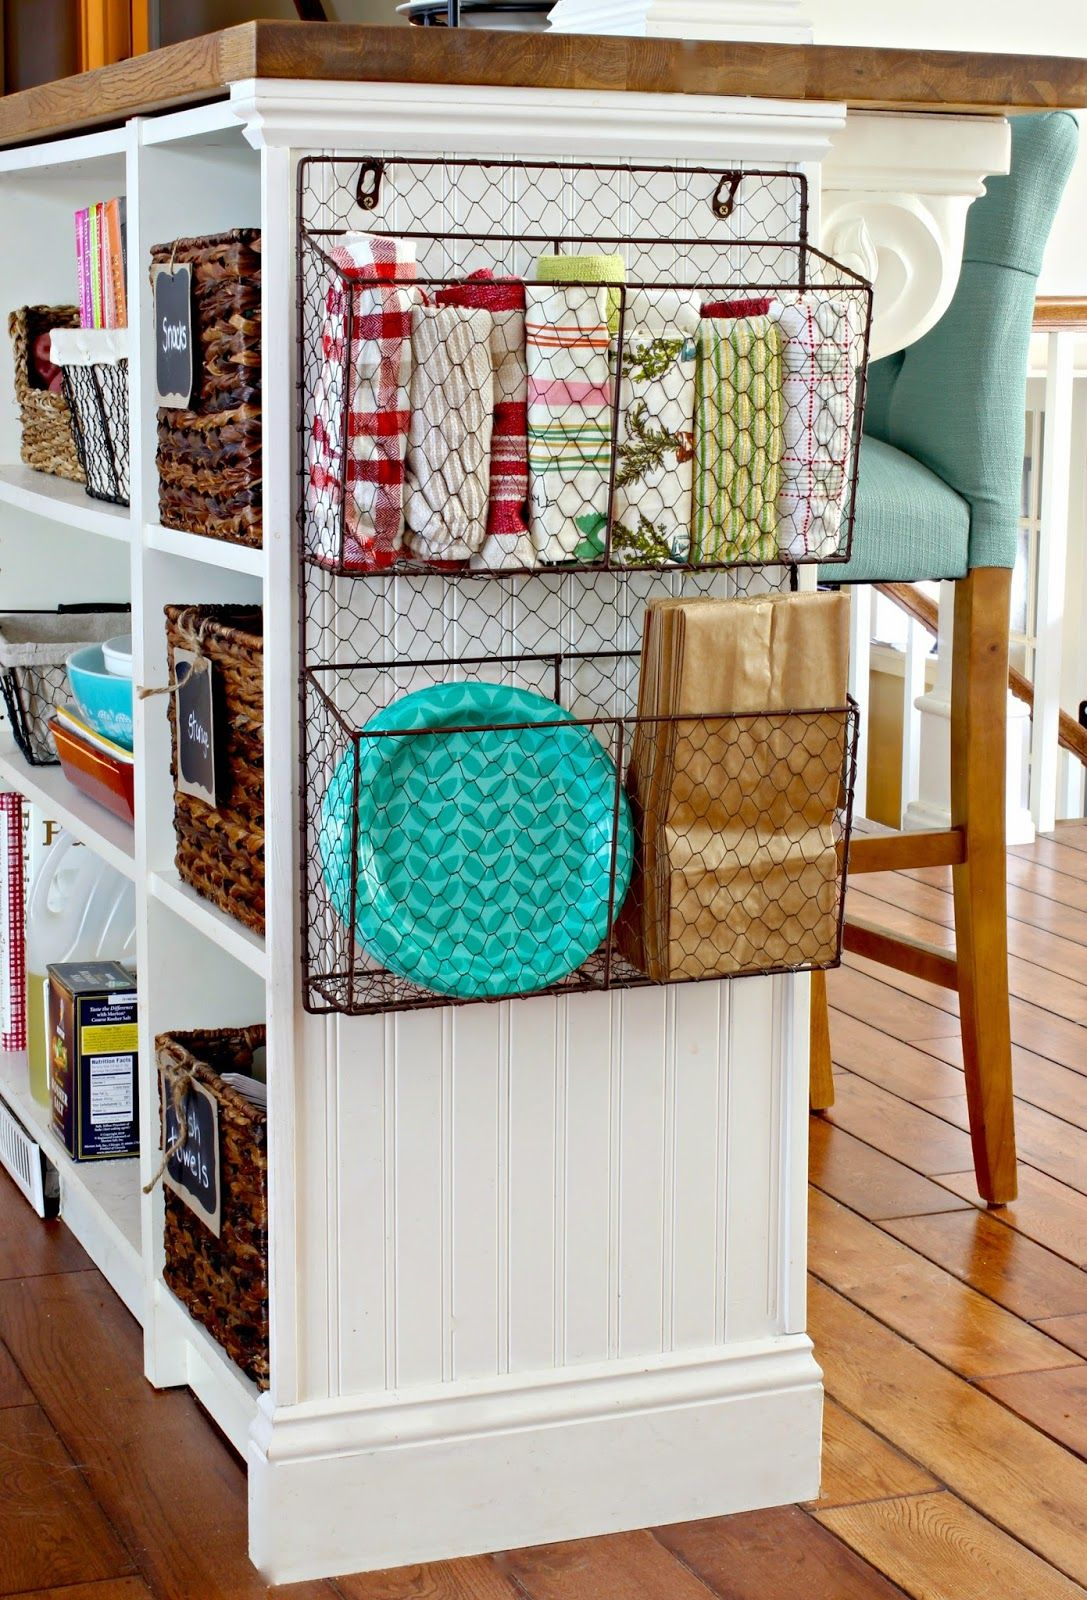 diy kitchen decor on pinterest kitchen islands cutting board and pot racks on kitchen island ideas organization id=54297